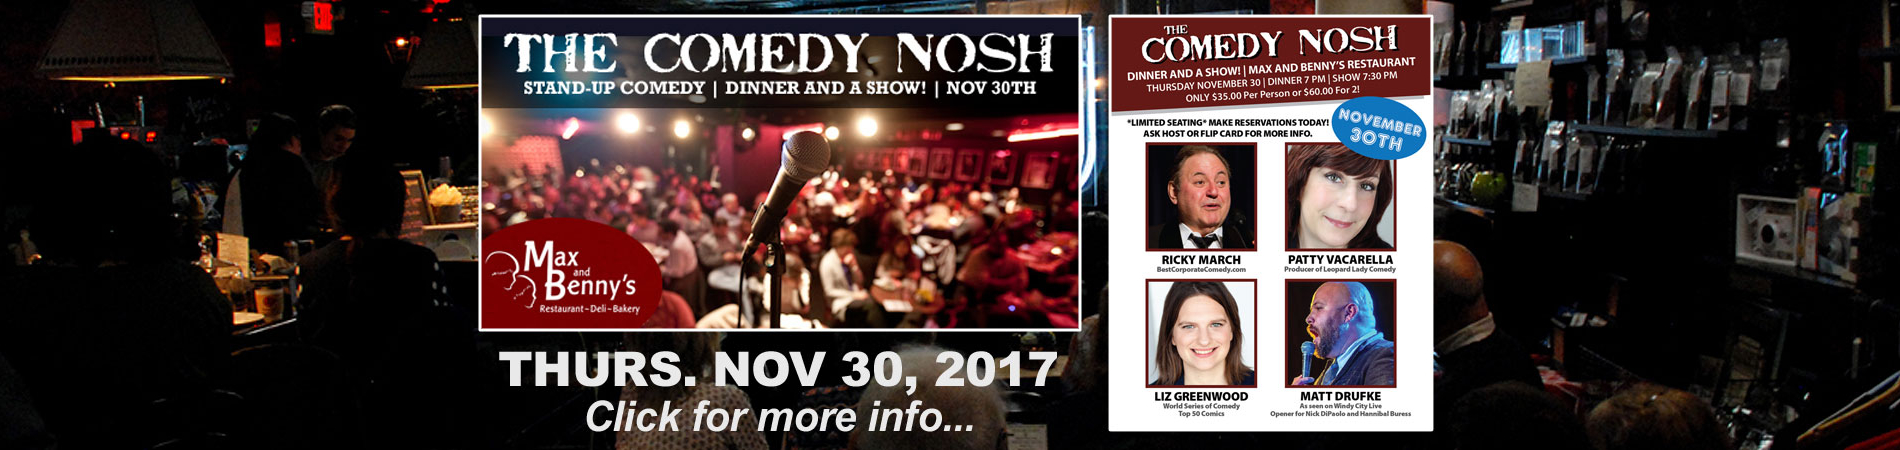 slider-comedynosh-11-2017